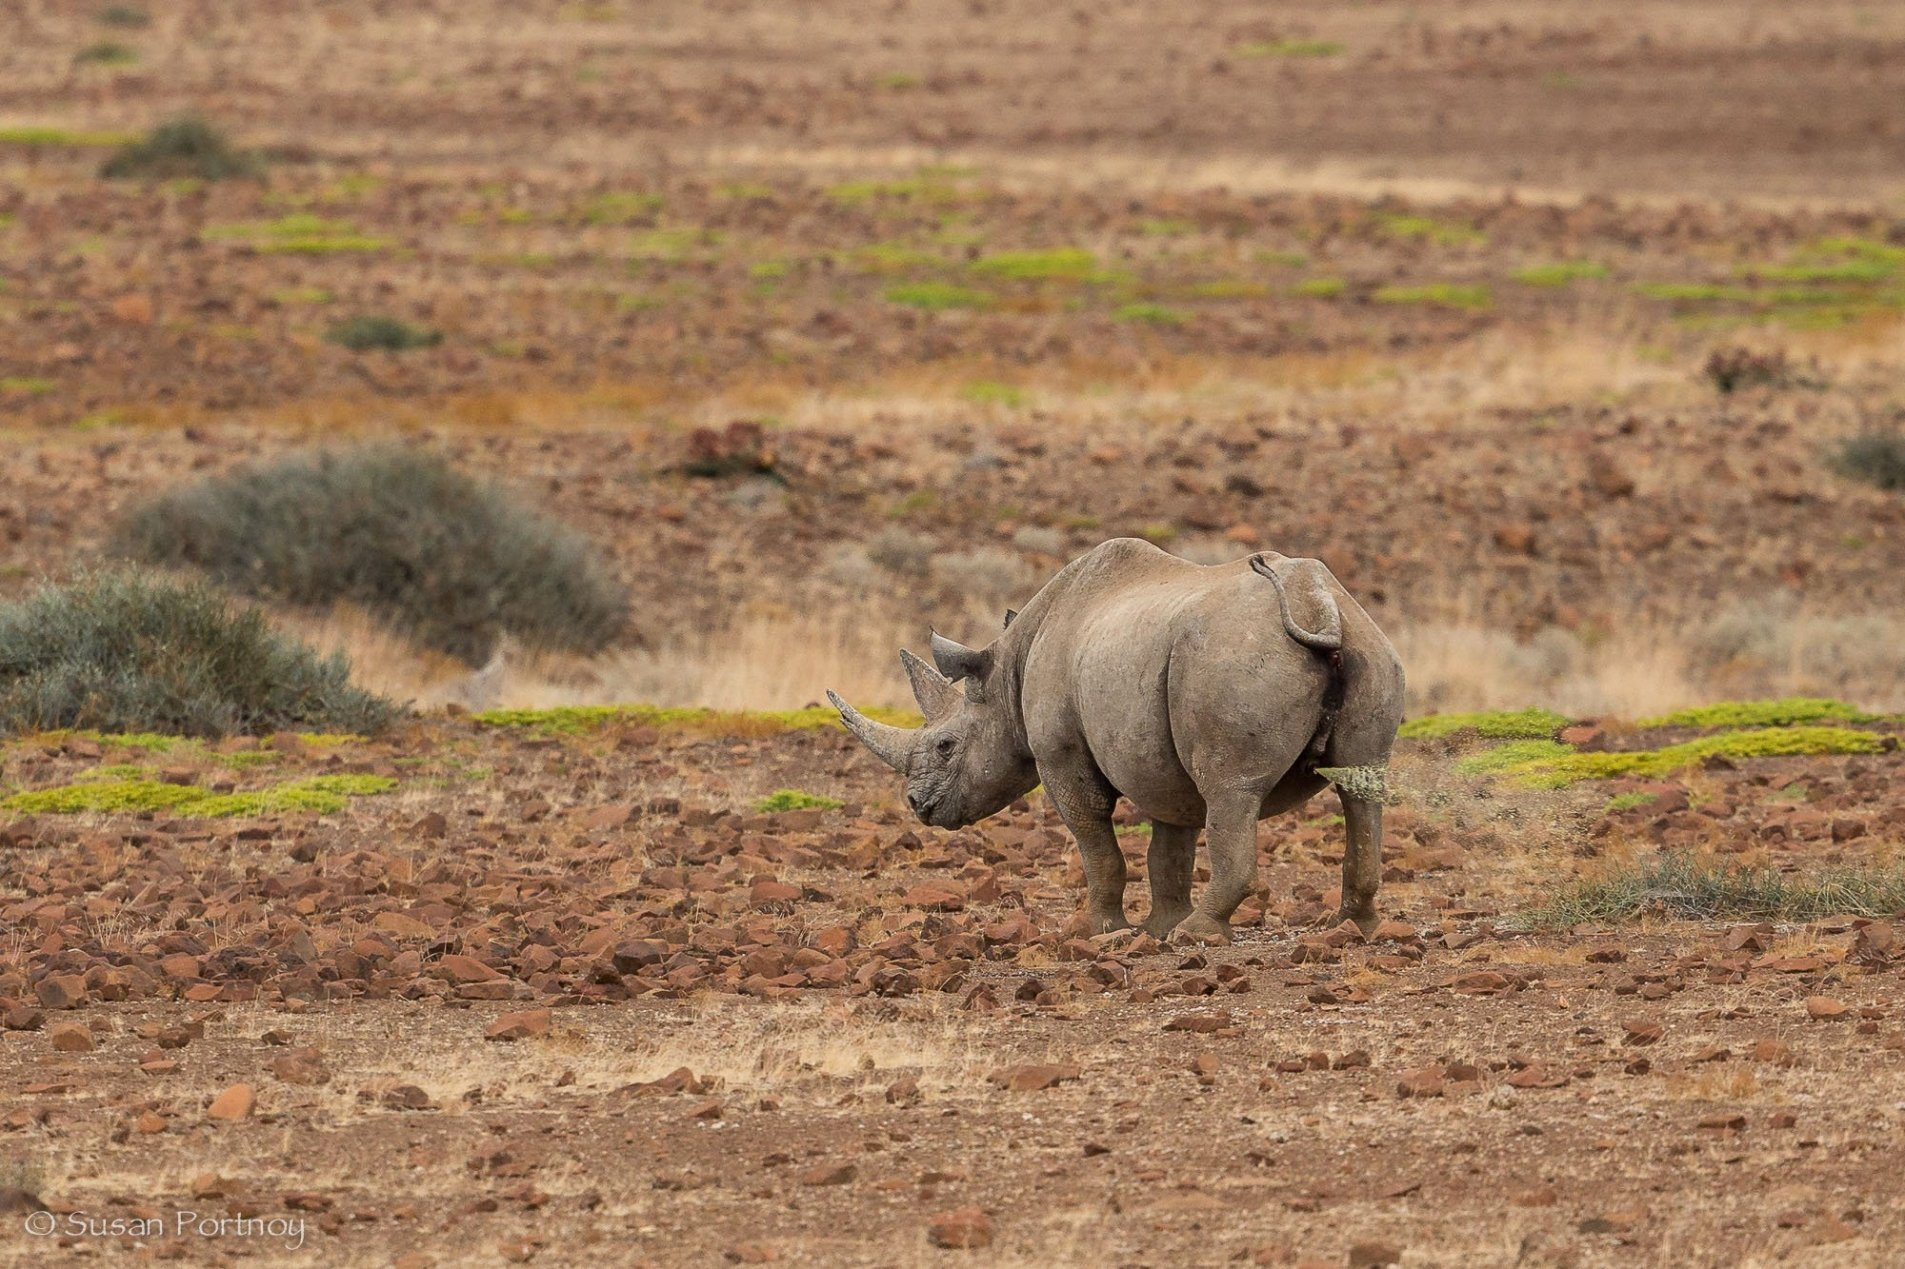 Kangombe, a black rhino marks his territory near Desert Rhino Camp in Namibia